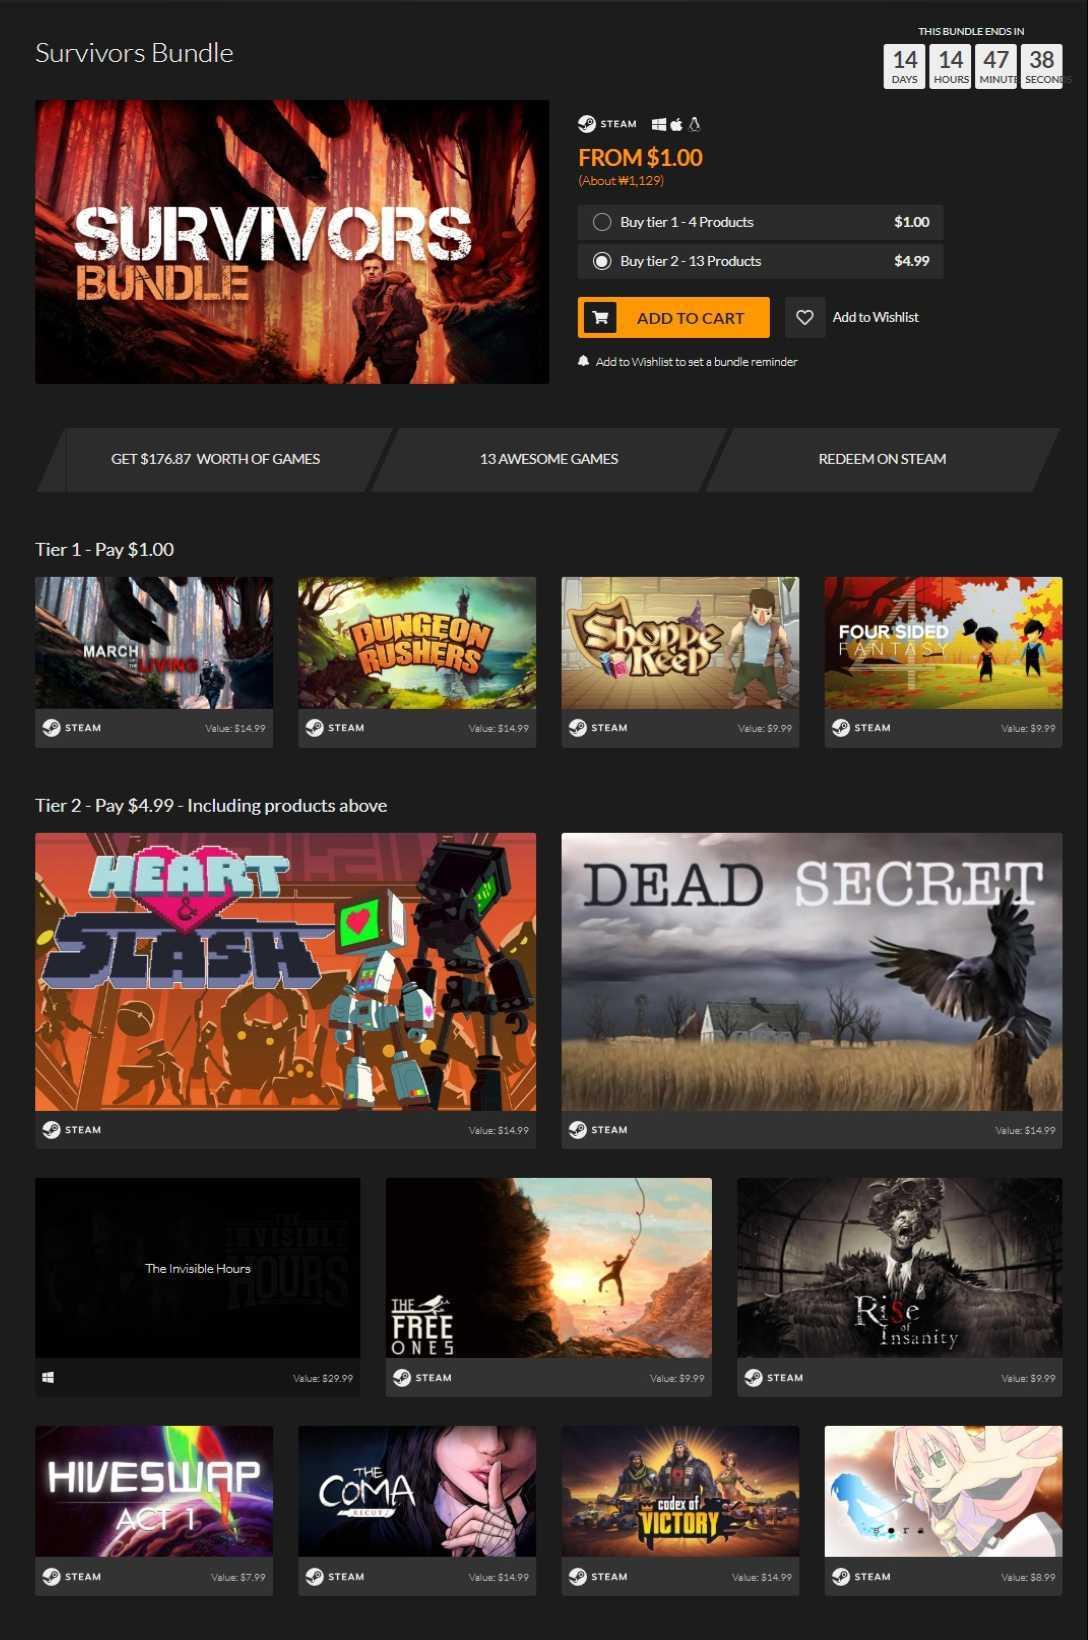 screenshot-www.fanatical.com-2018.11.22-02-12-22.jpg